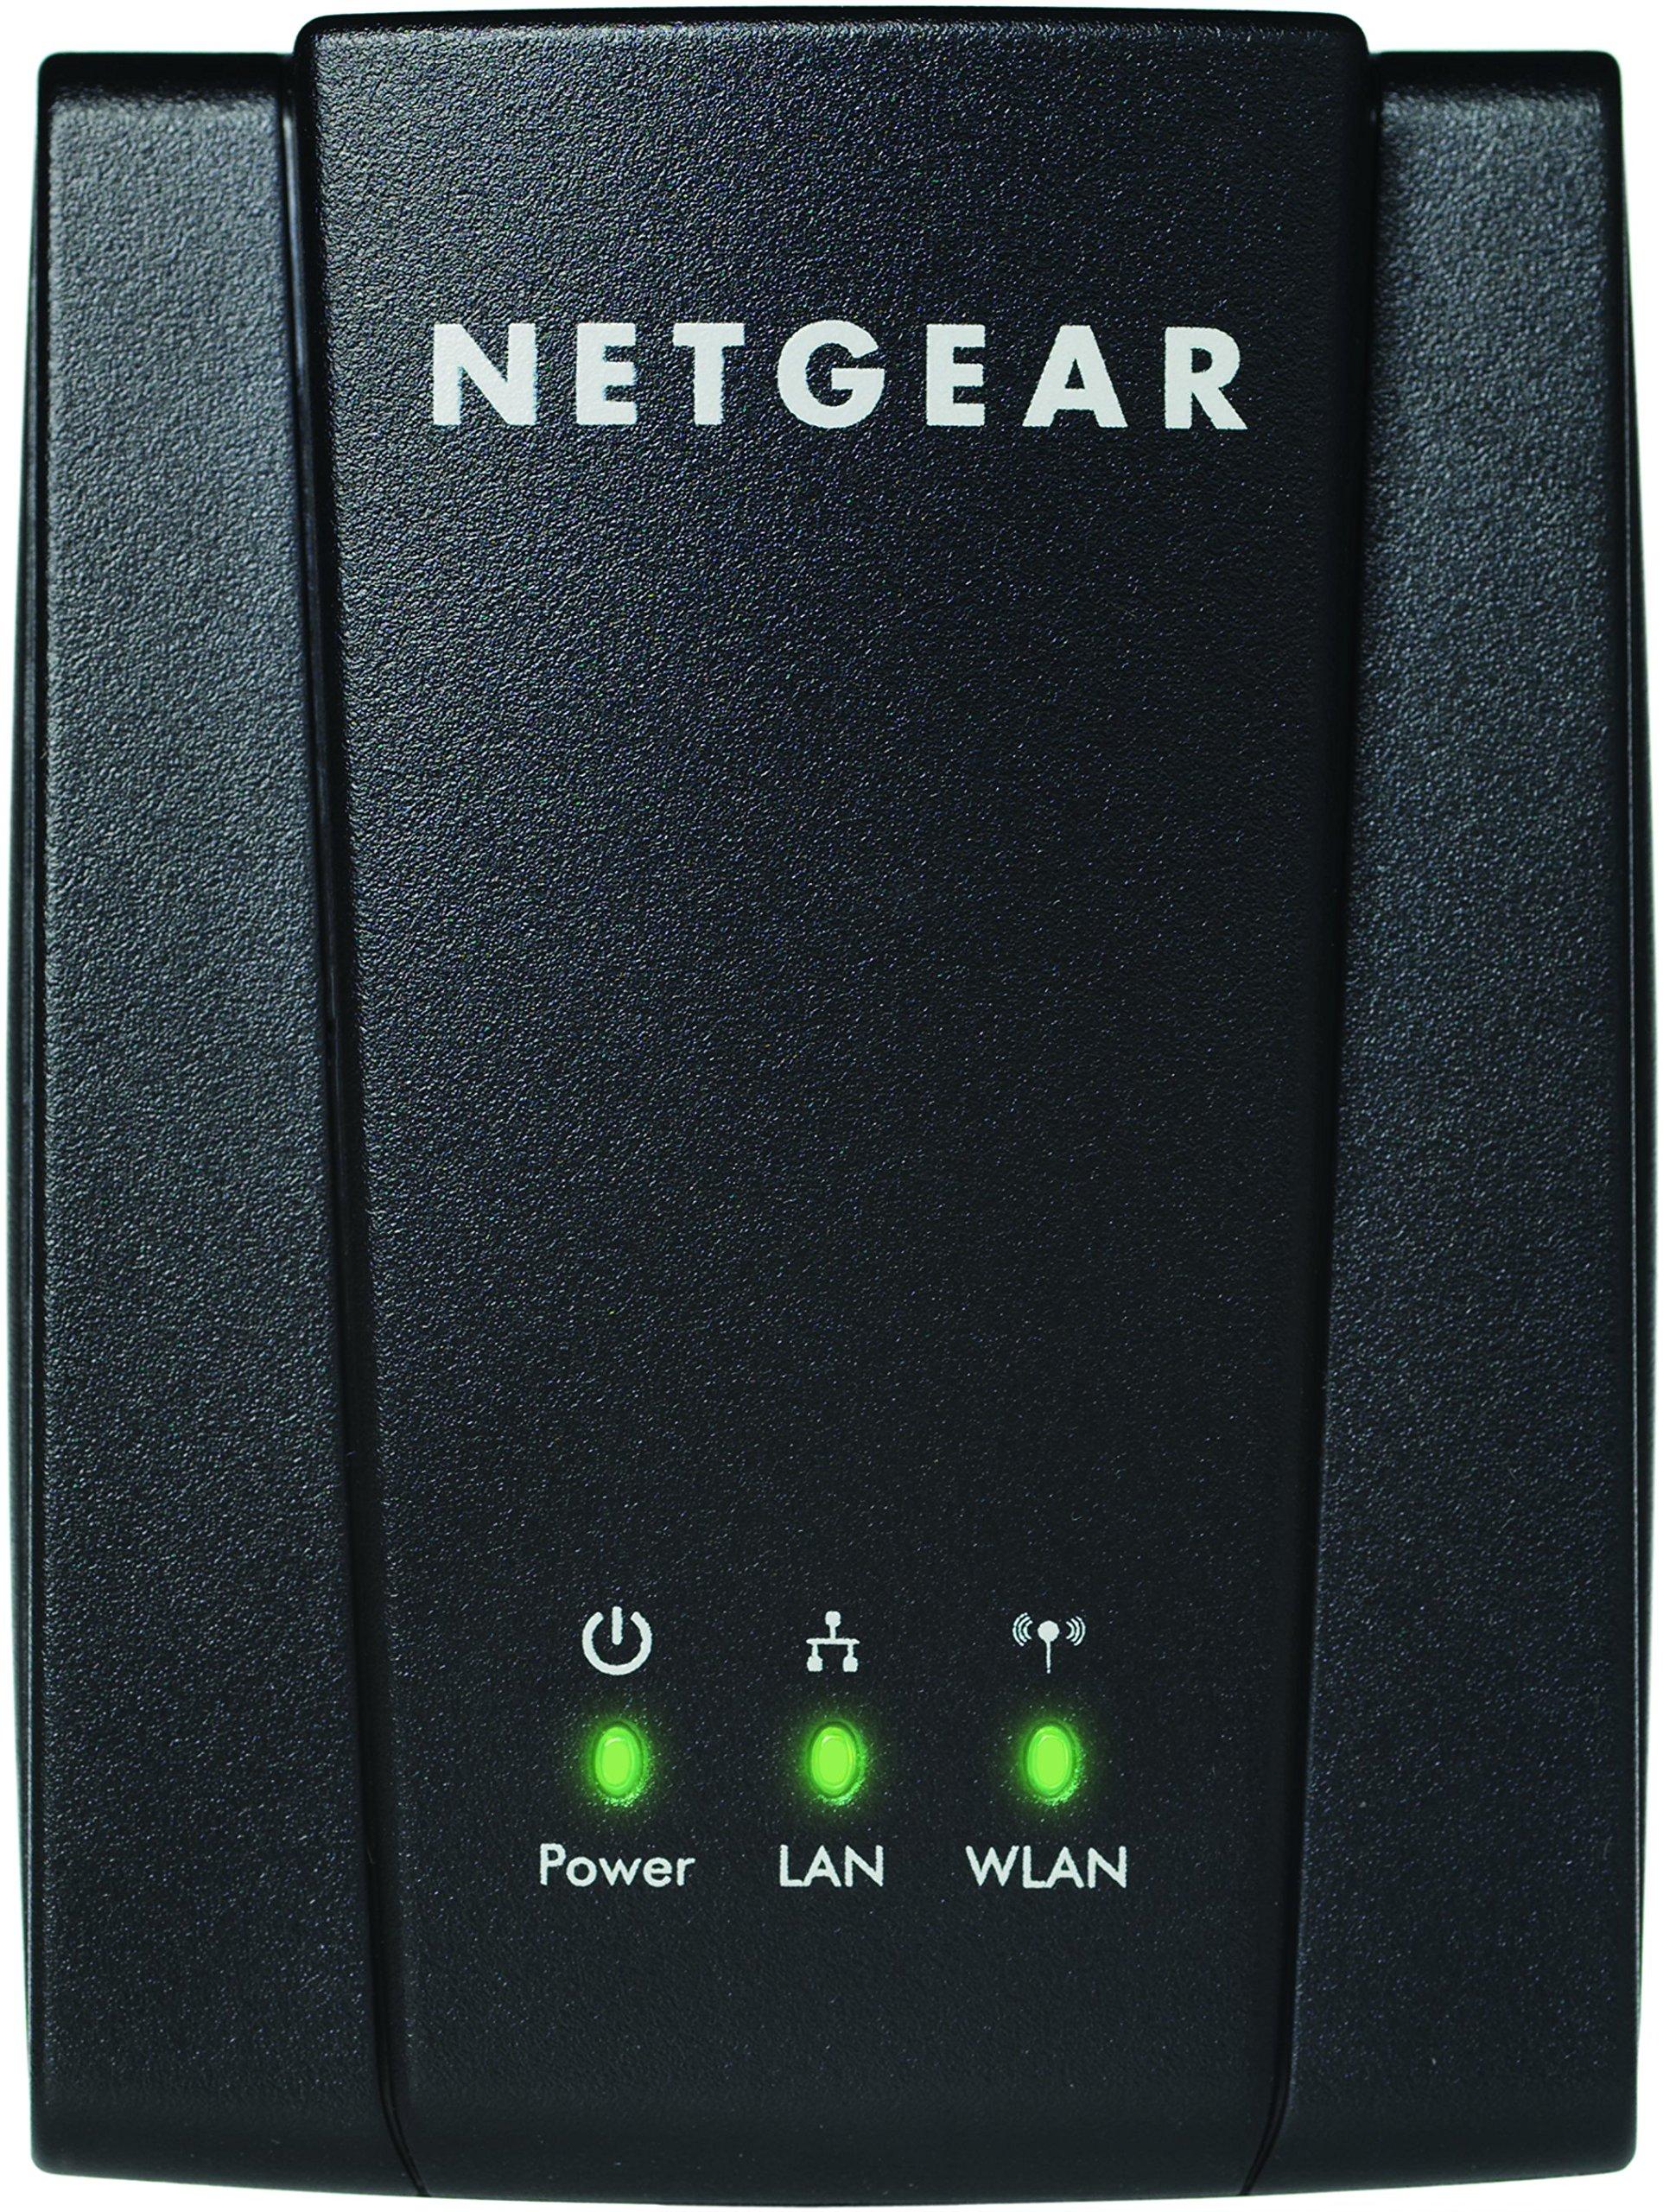 NETGEAR Universal N300 Wi-Fi to Ethernet Adapter (WNCE2001) by NETGEAR (Image #3)